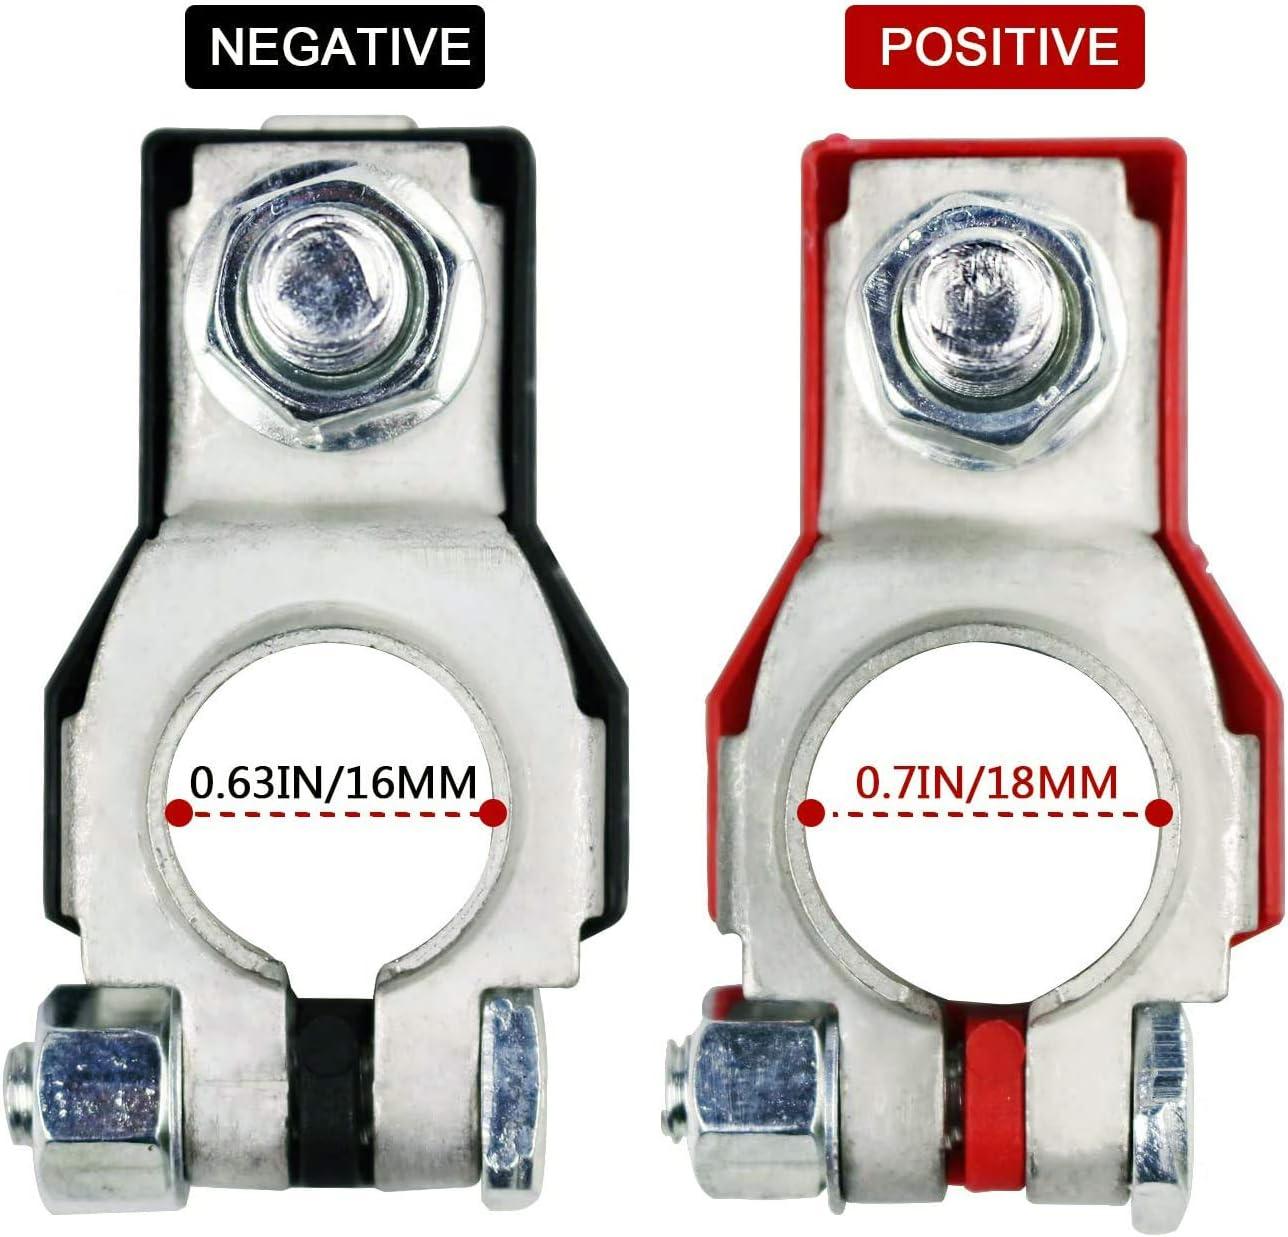 Murano,243407F000,24340-7F000 Maxima 243407F001 Positive and Negative,Plastic Cove,Copper Plate, Compatible for Nissan Sentra Rouge Altima Battery Terminals for Nissan